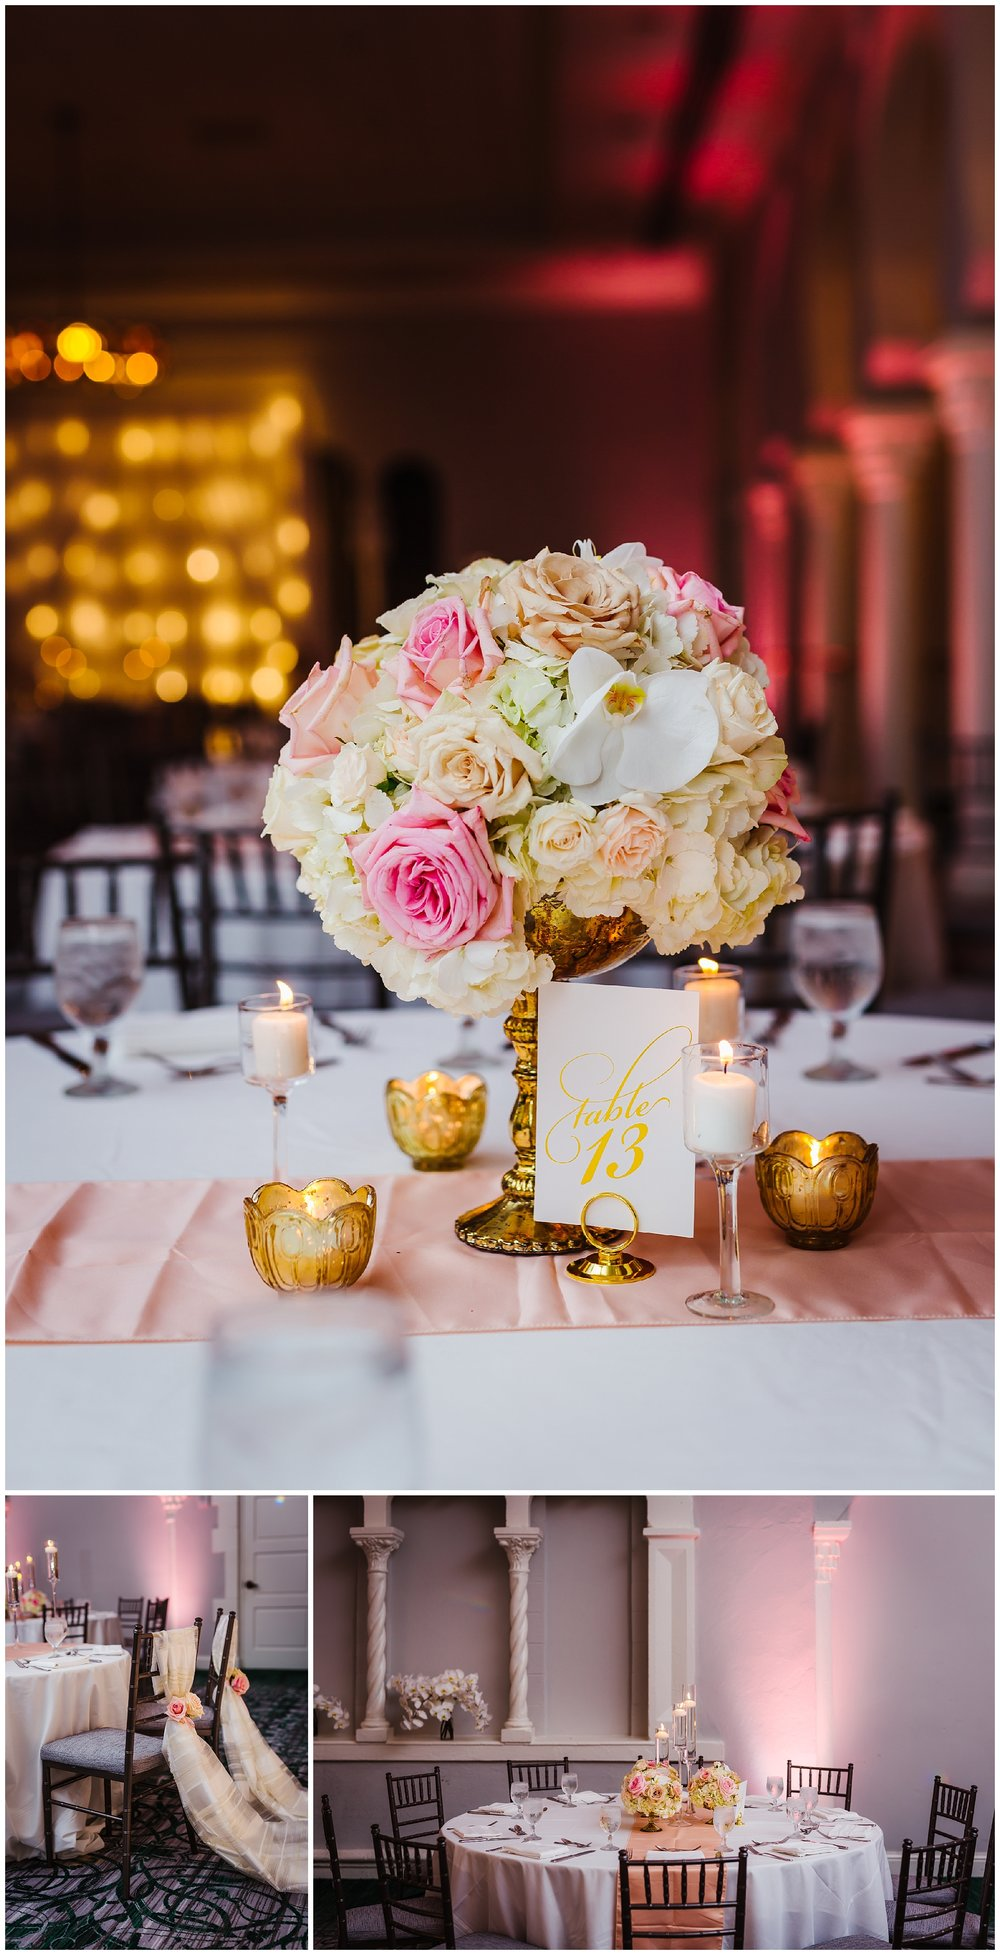 vinoy-sunset-ballroom-rainy-day-wedding-photography-orchids-trinidad-flawless-fetes-ashlee-hamon_0143.jpg